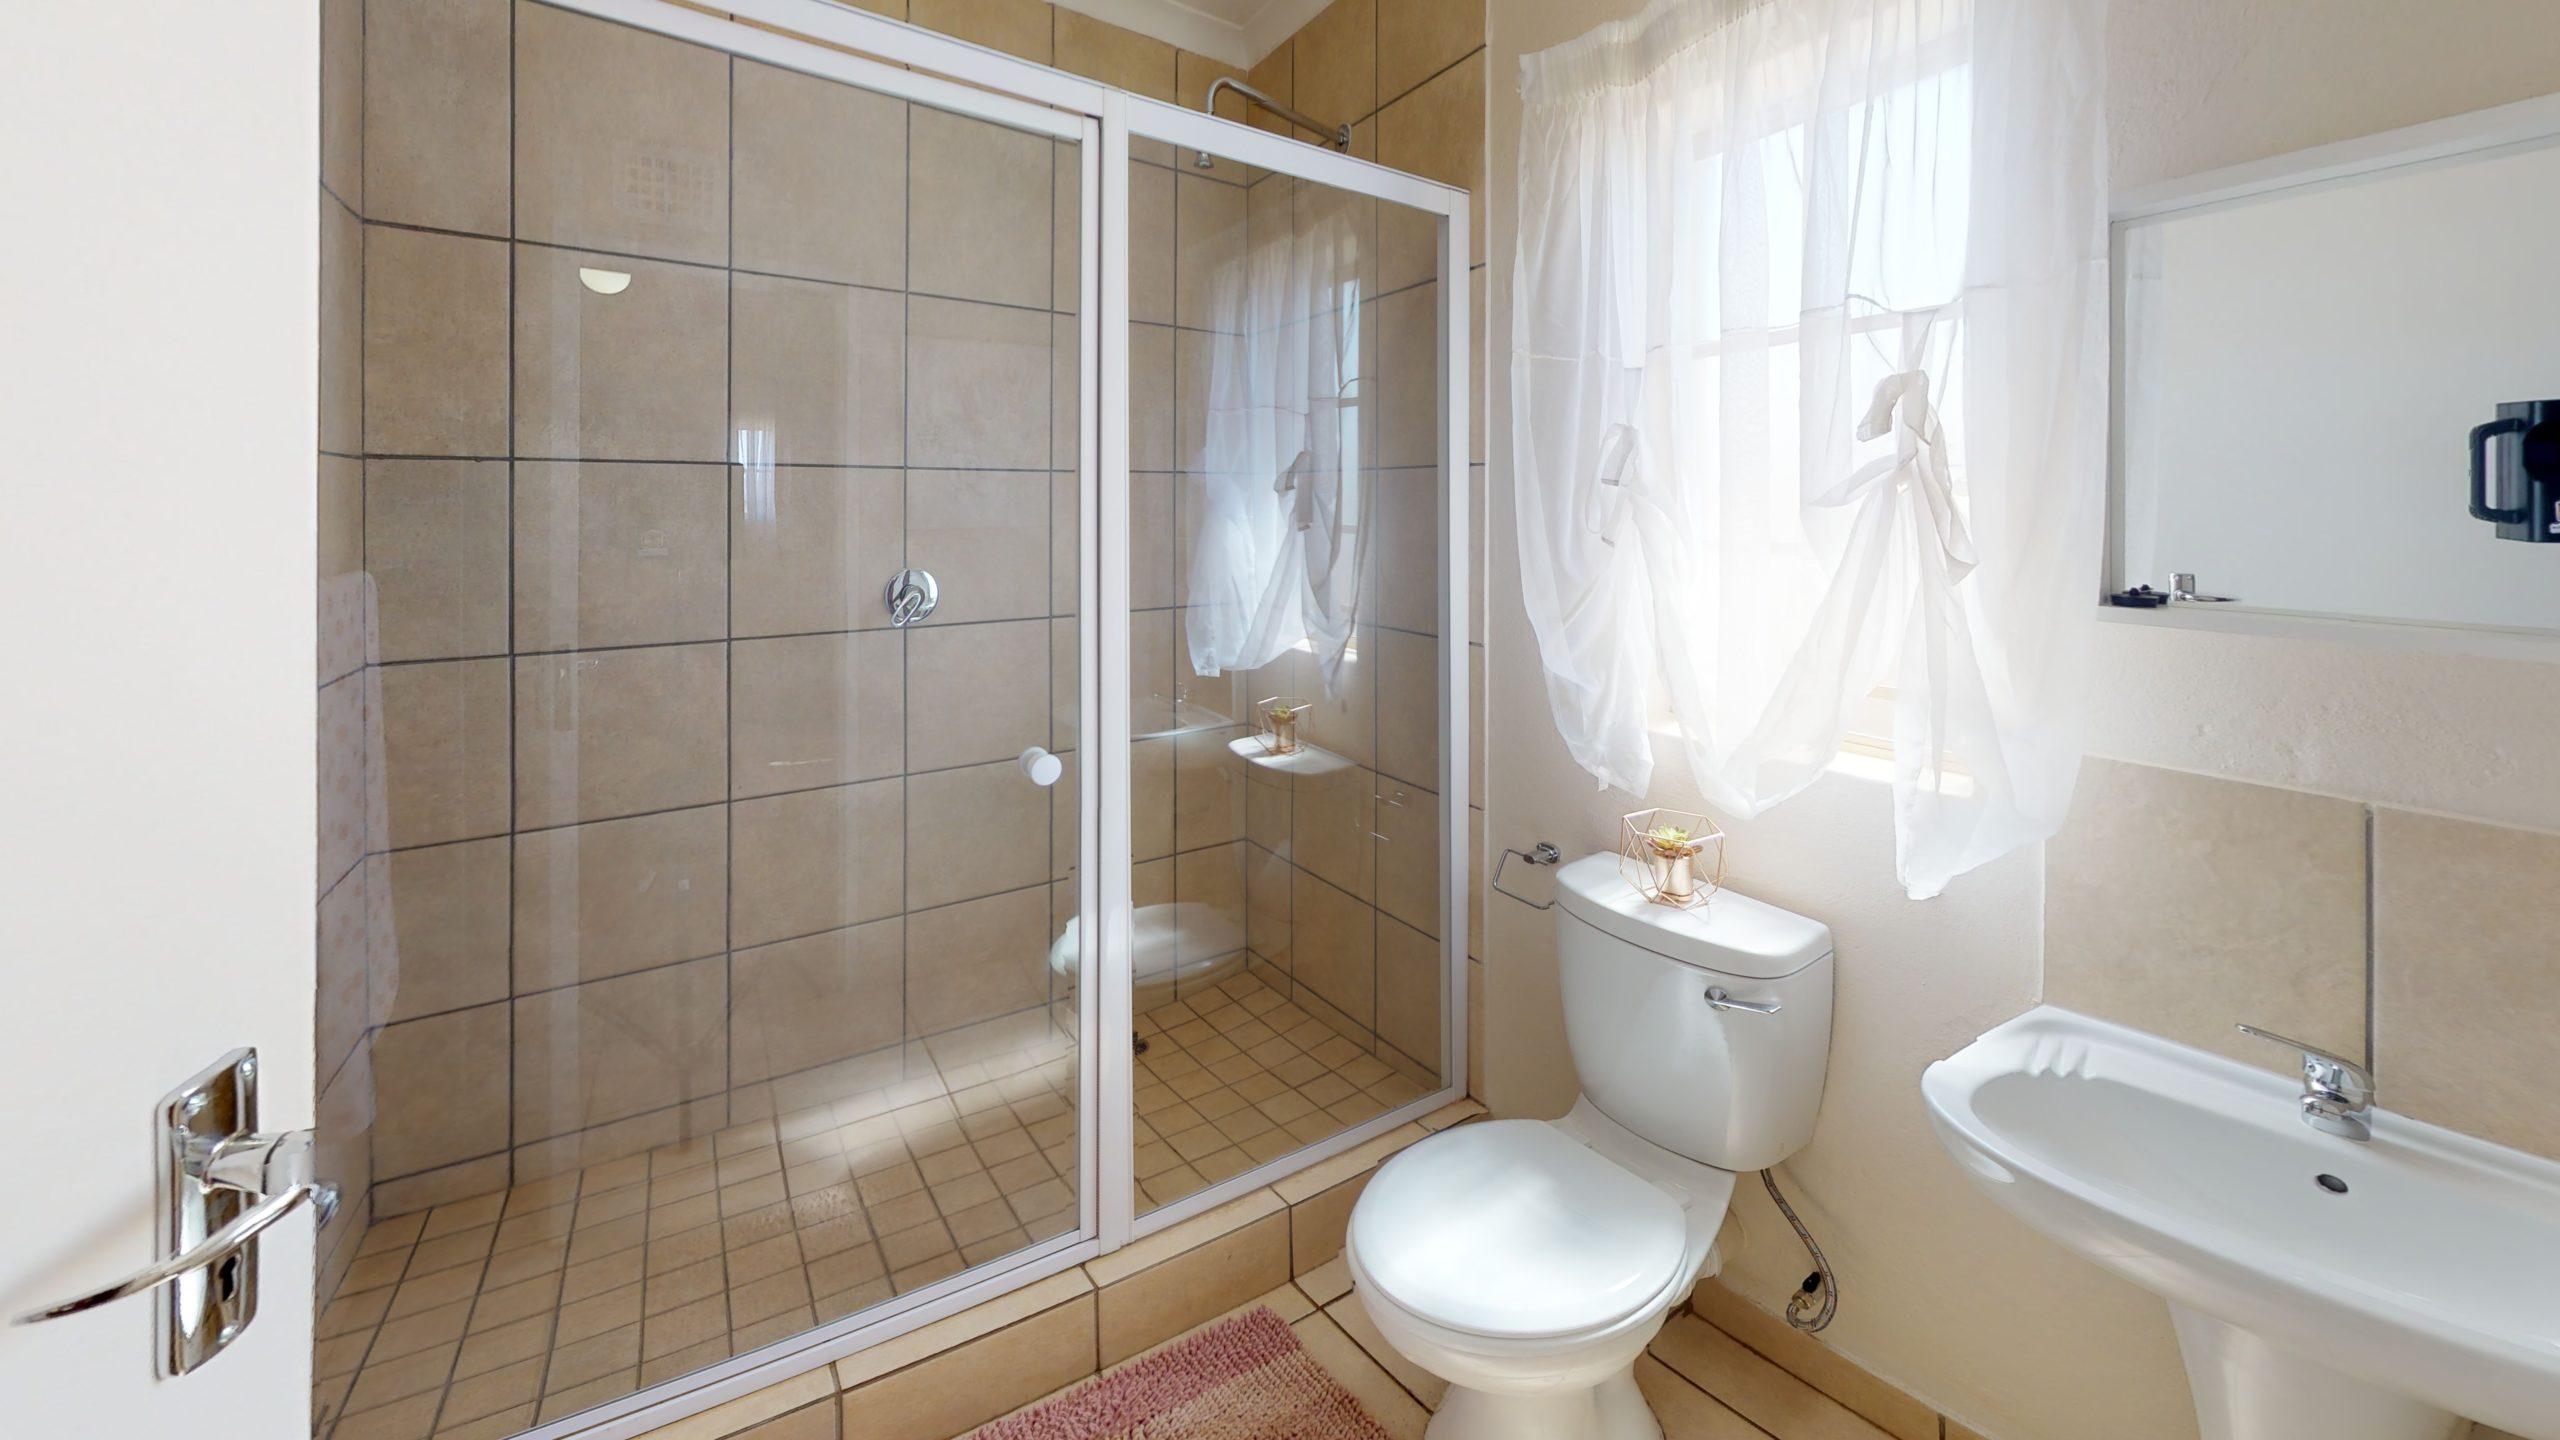 Sky City, Homes for Sale in Alberton, Gauteng - Bathroom